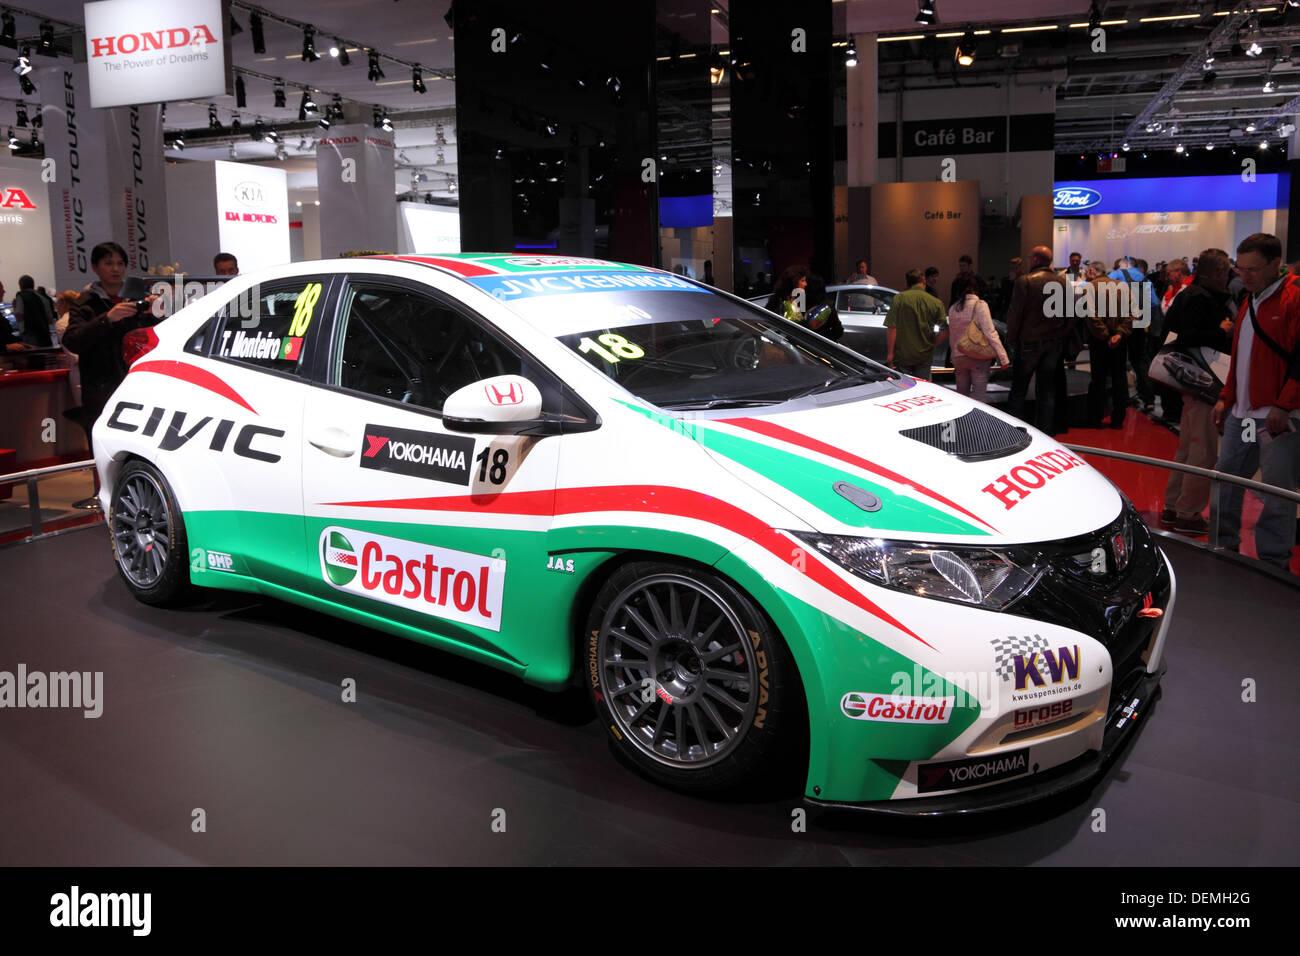 Honda civic racing cars images for Honda civic race car